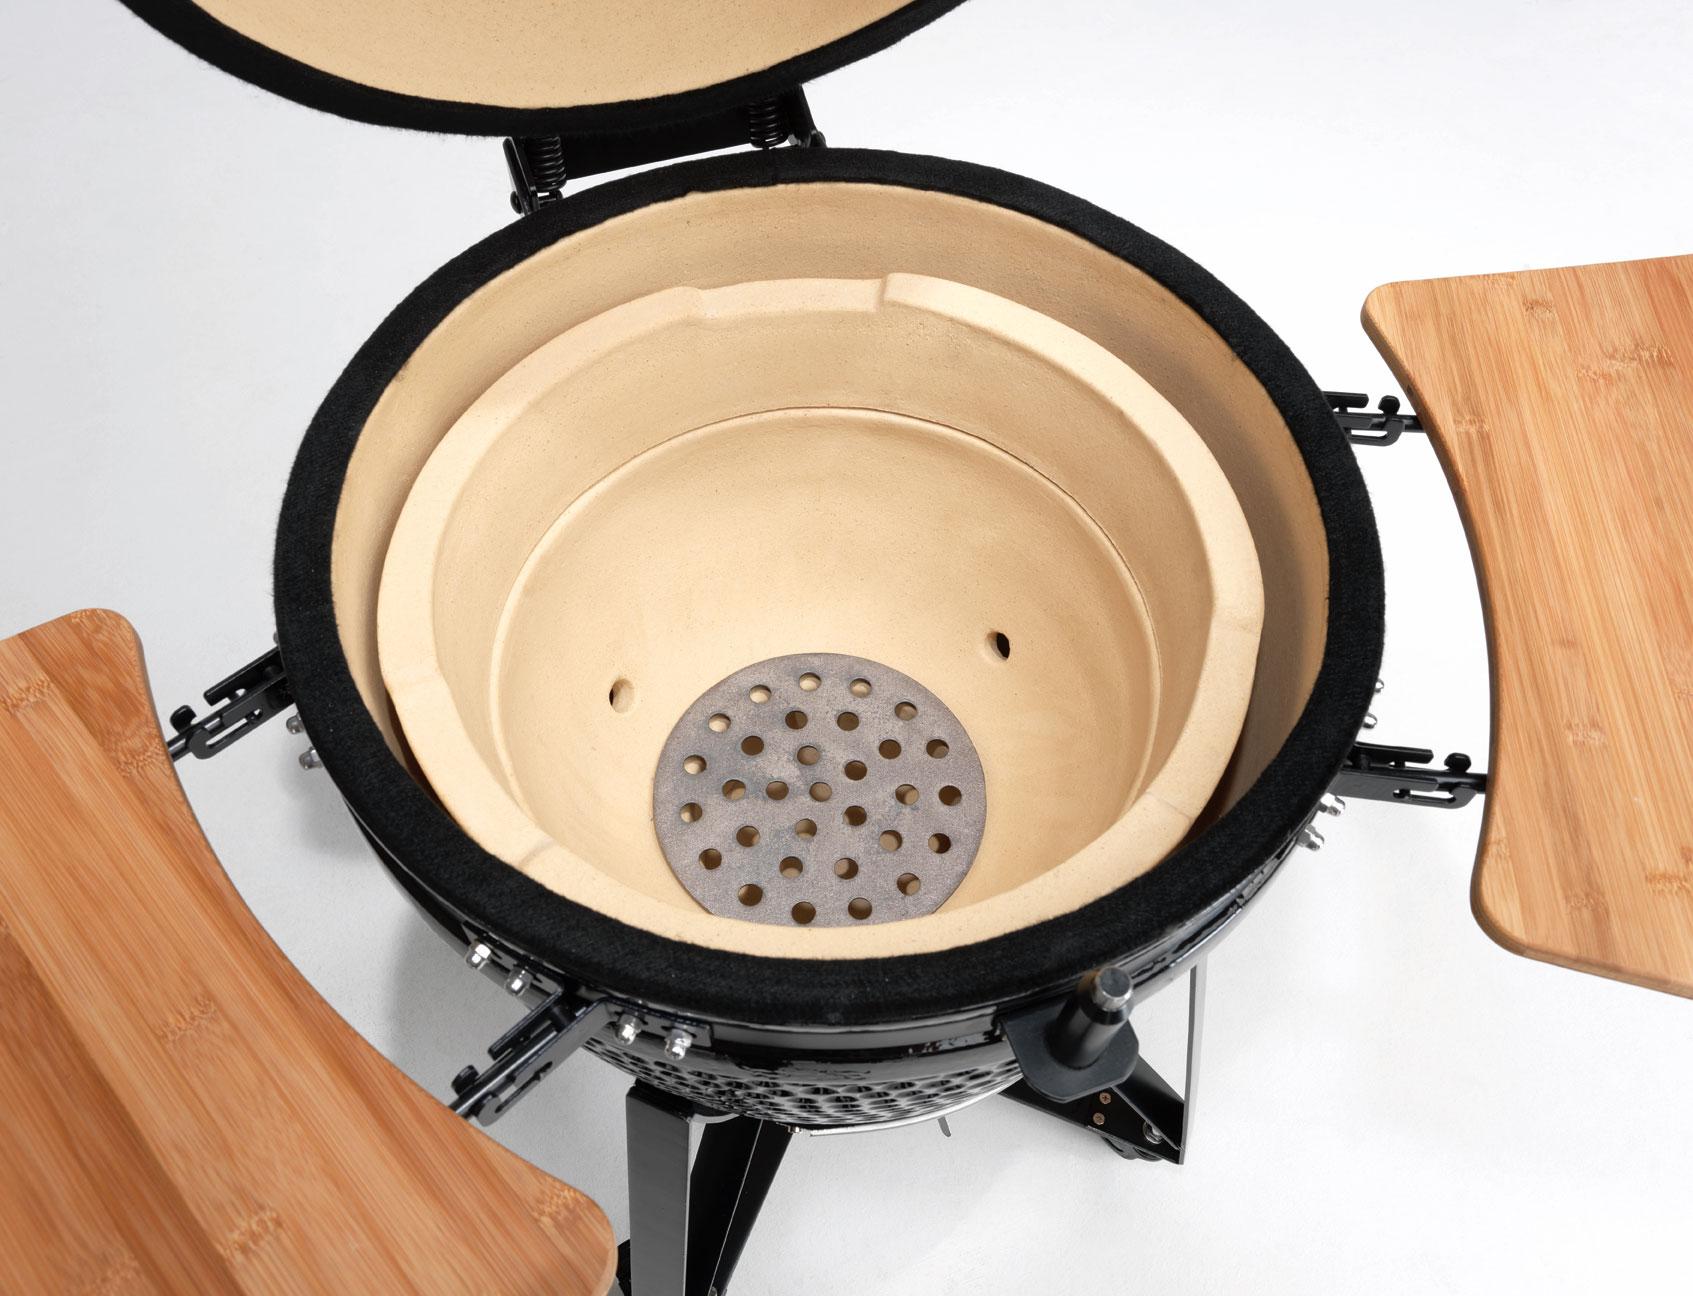 Holzkohlegrill / Keramikgrill Justus Black J'Egg XL Grillfläche Ø47cm Bild 2